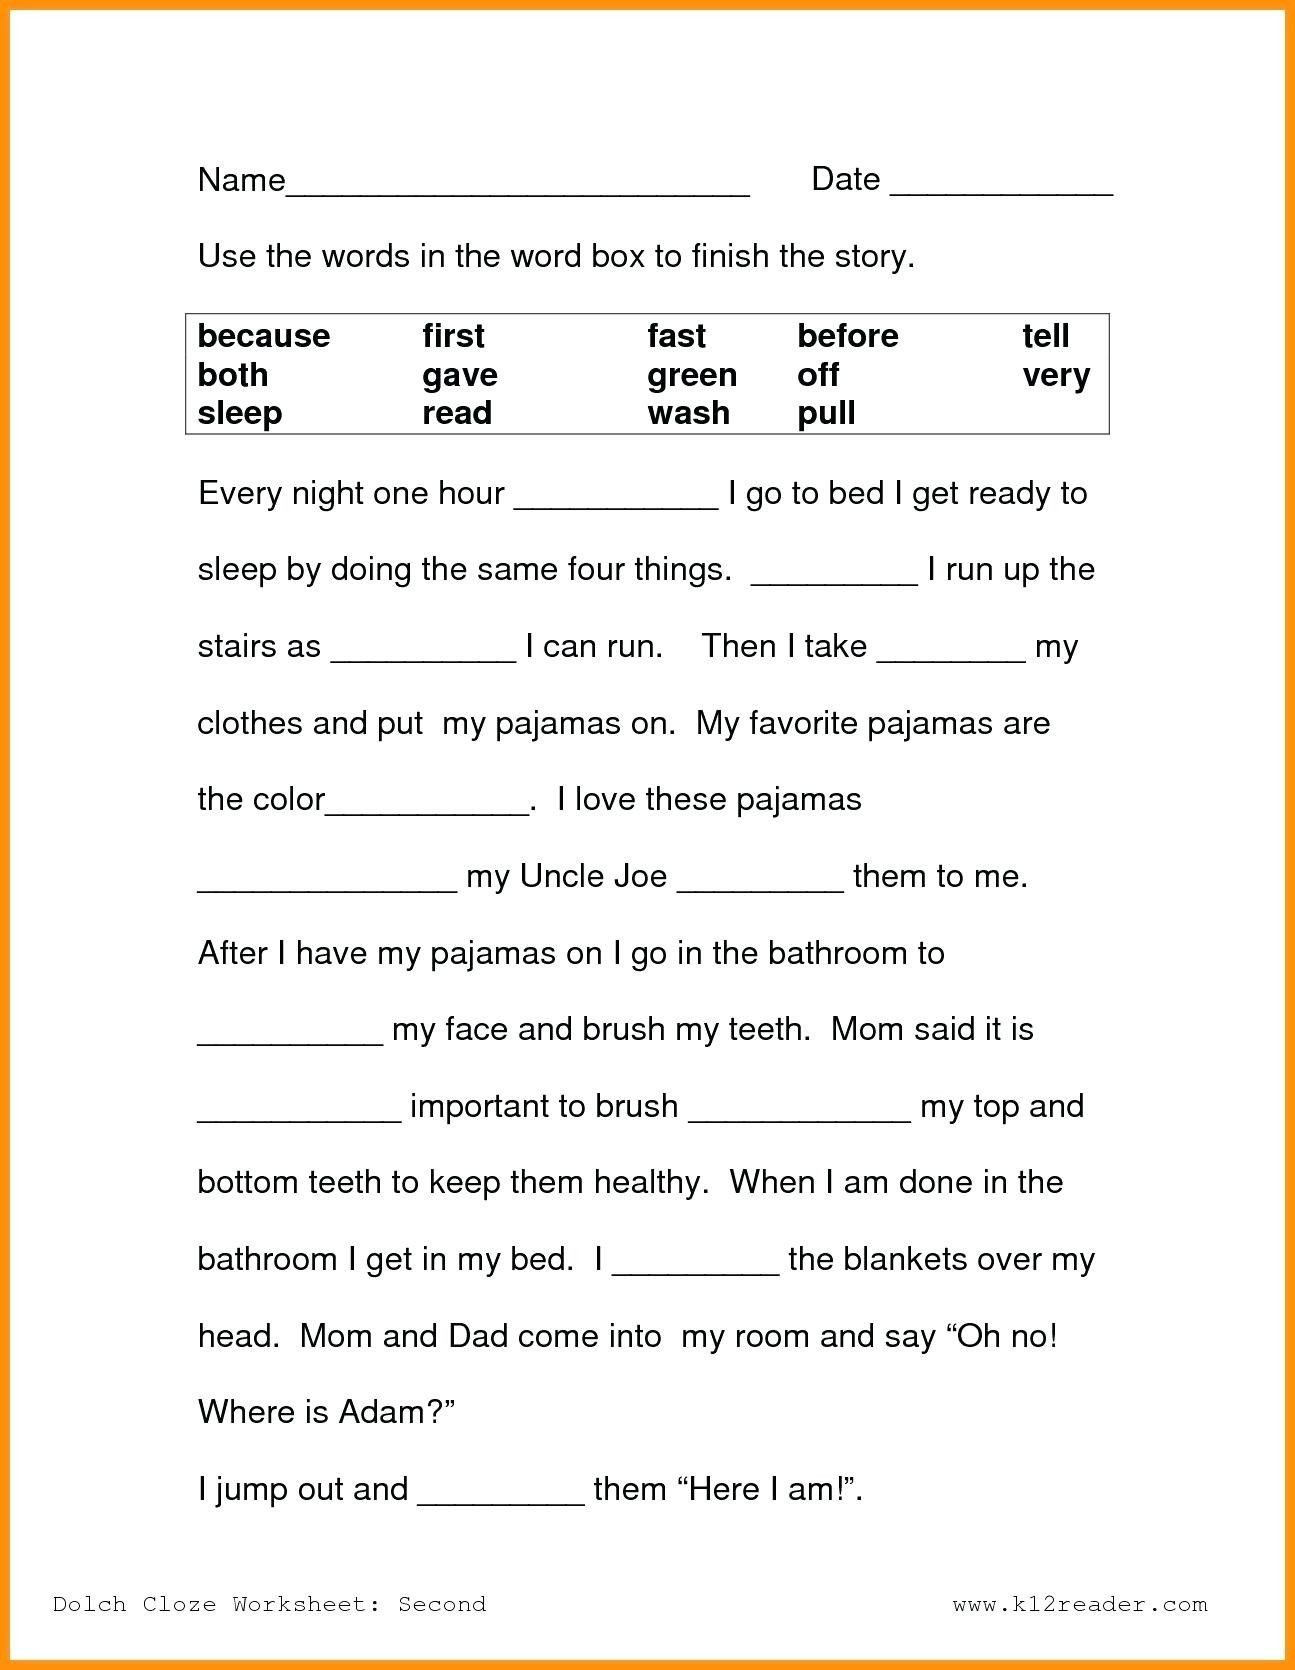 Winston Grammar 6th Grade Worksheet Printable   Printable Worksheets and  Activities for Teachers [ 1670 x 1295 Pixel ]